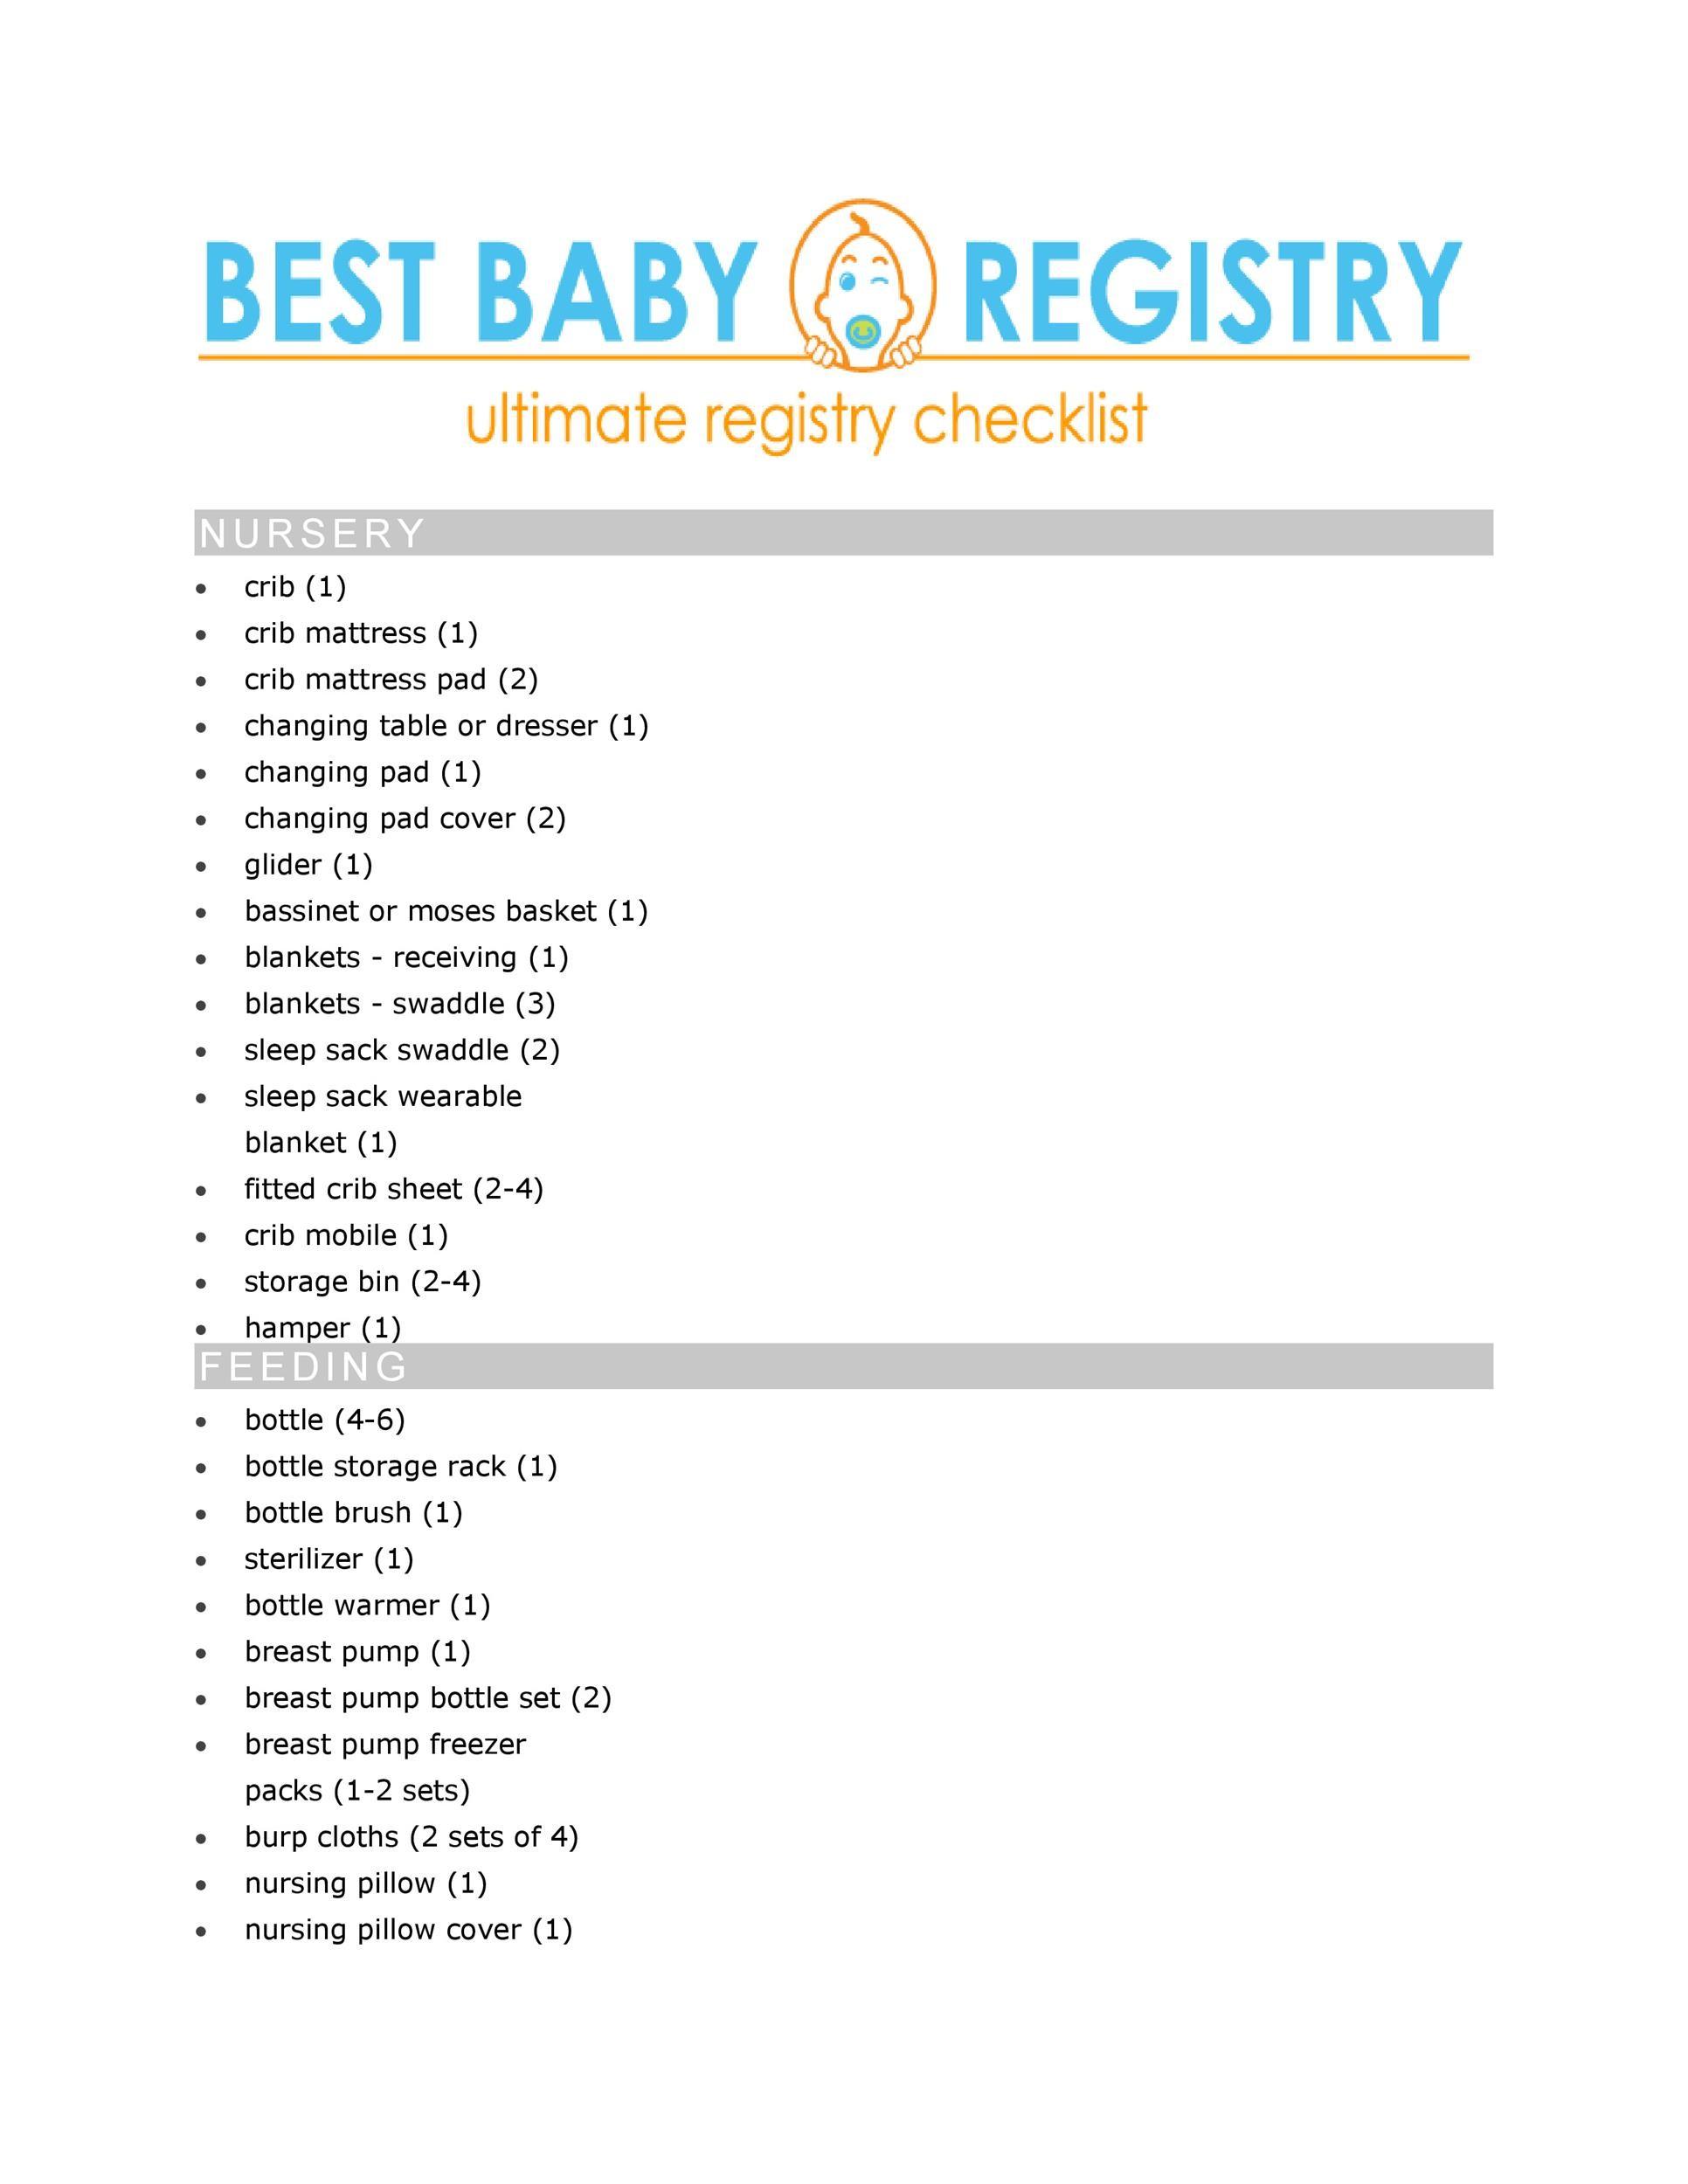 30+ Baby Registry Checklists (Newborn Baby Checklists) - Template Lab